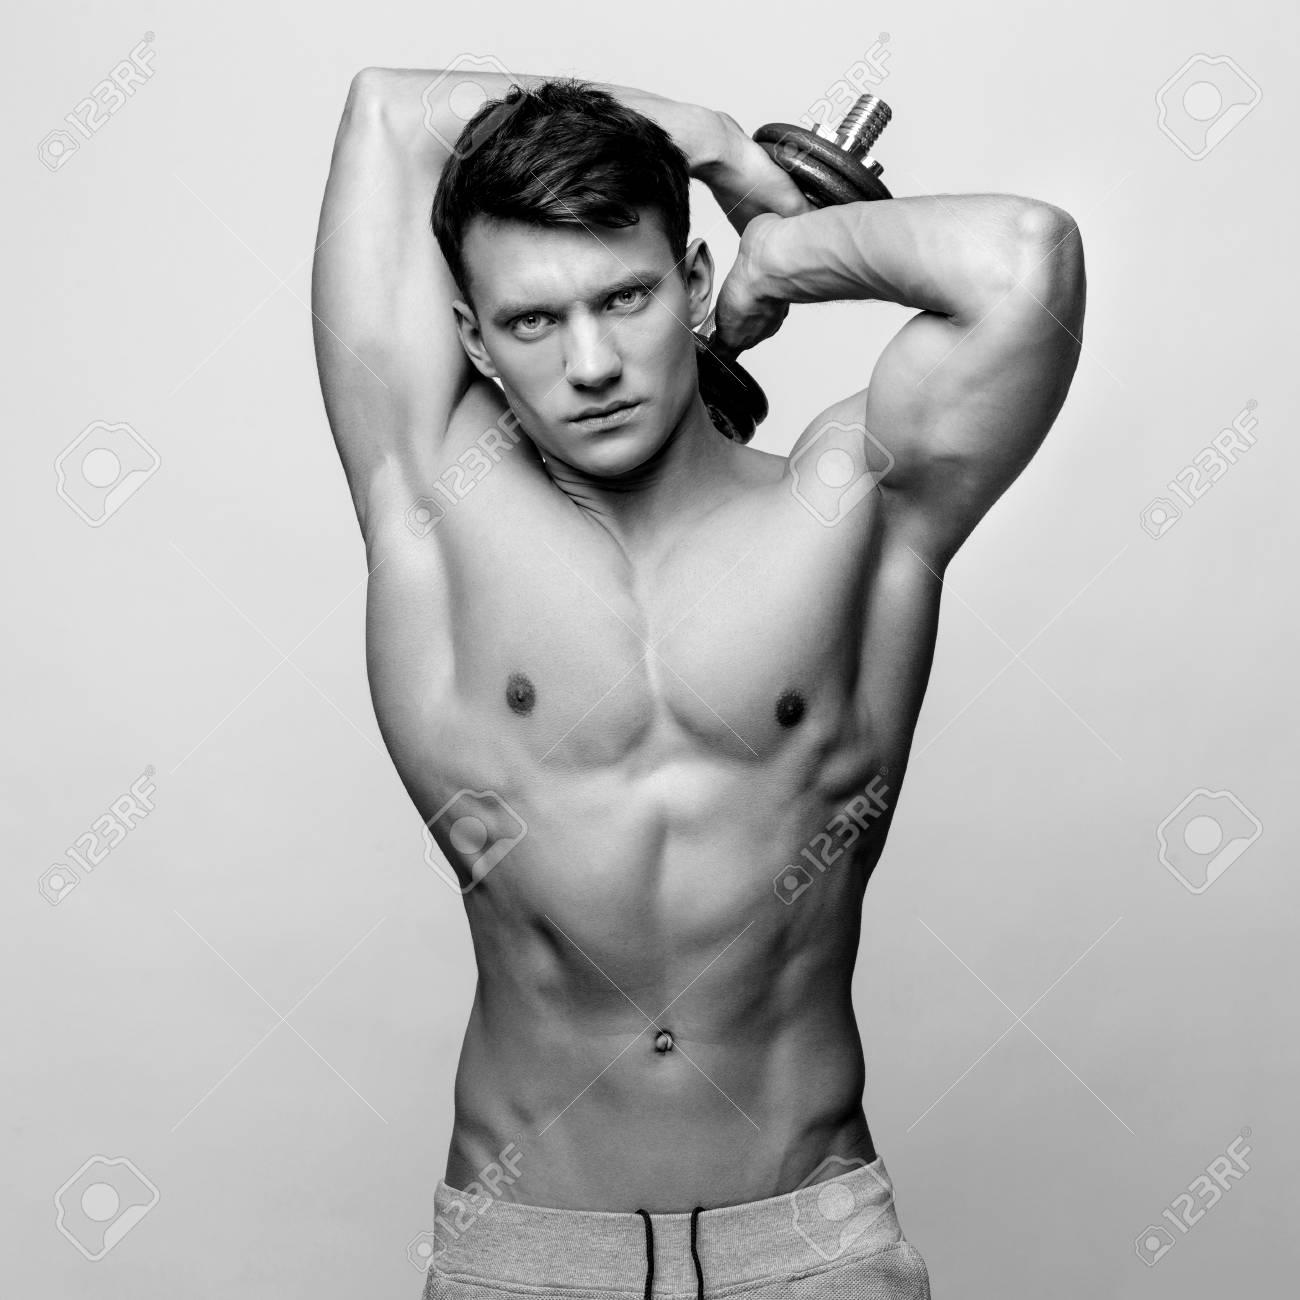 Studio Shot Of Shirtless Bodybuilder Holding Dumbell And Showing